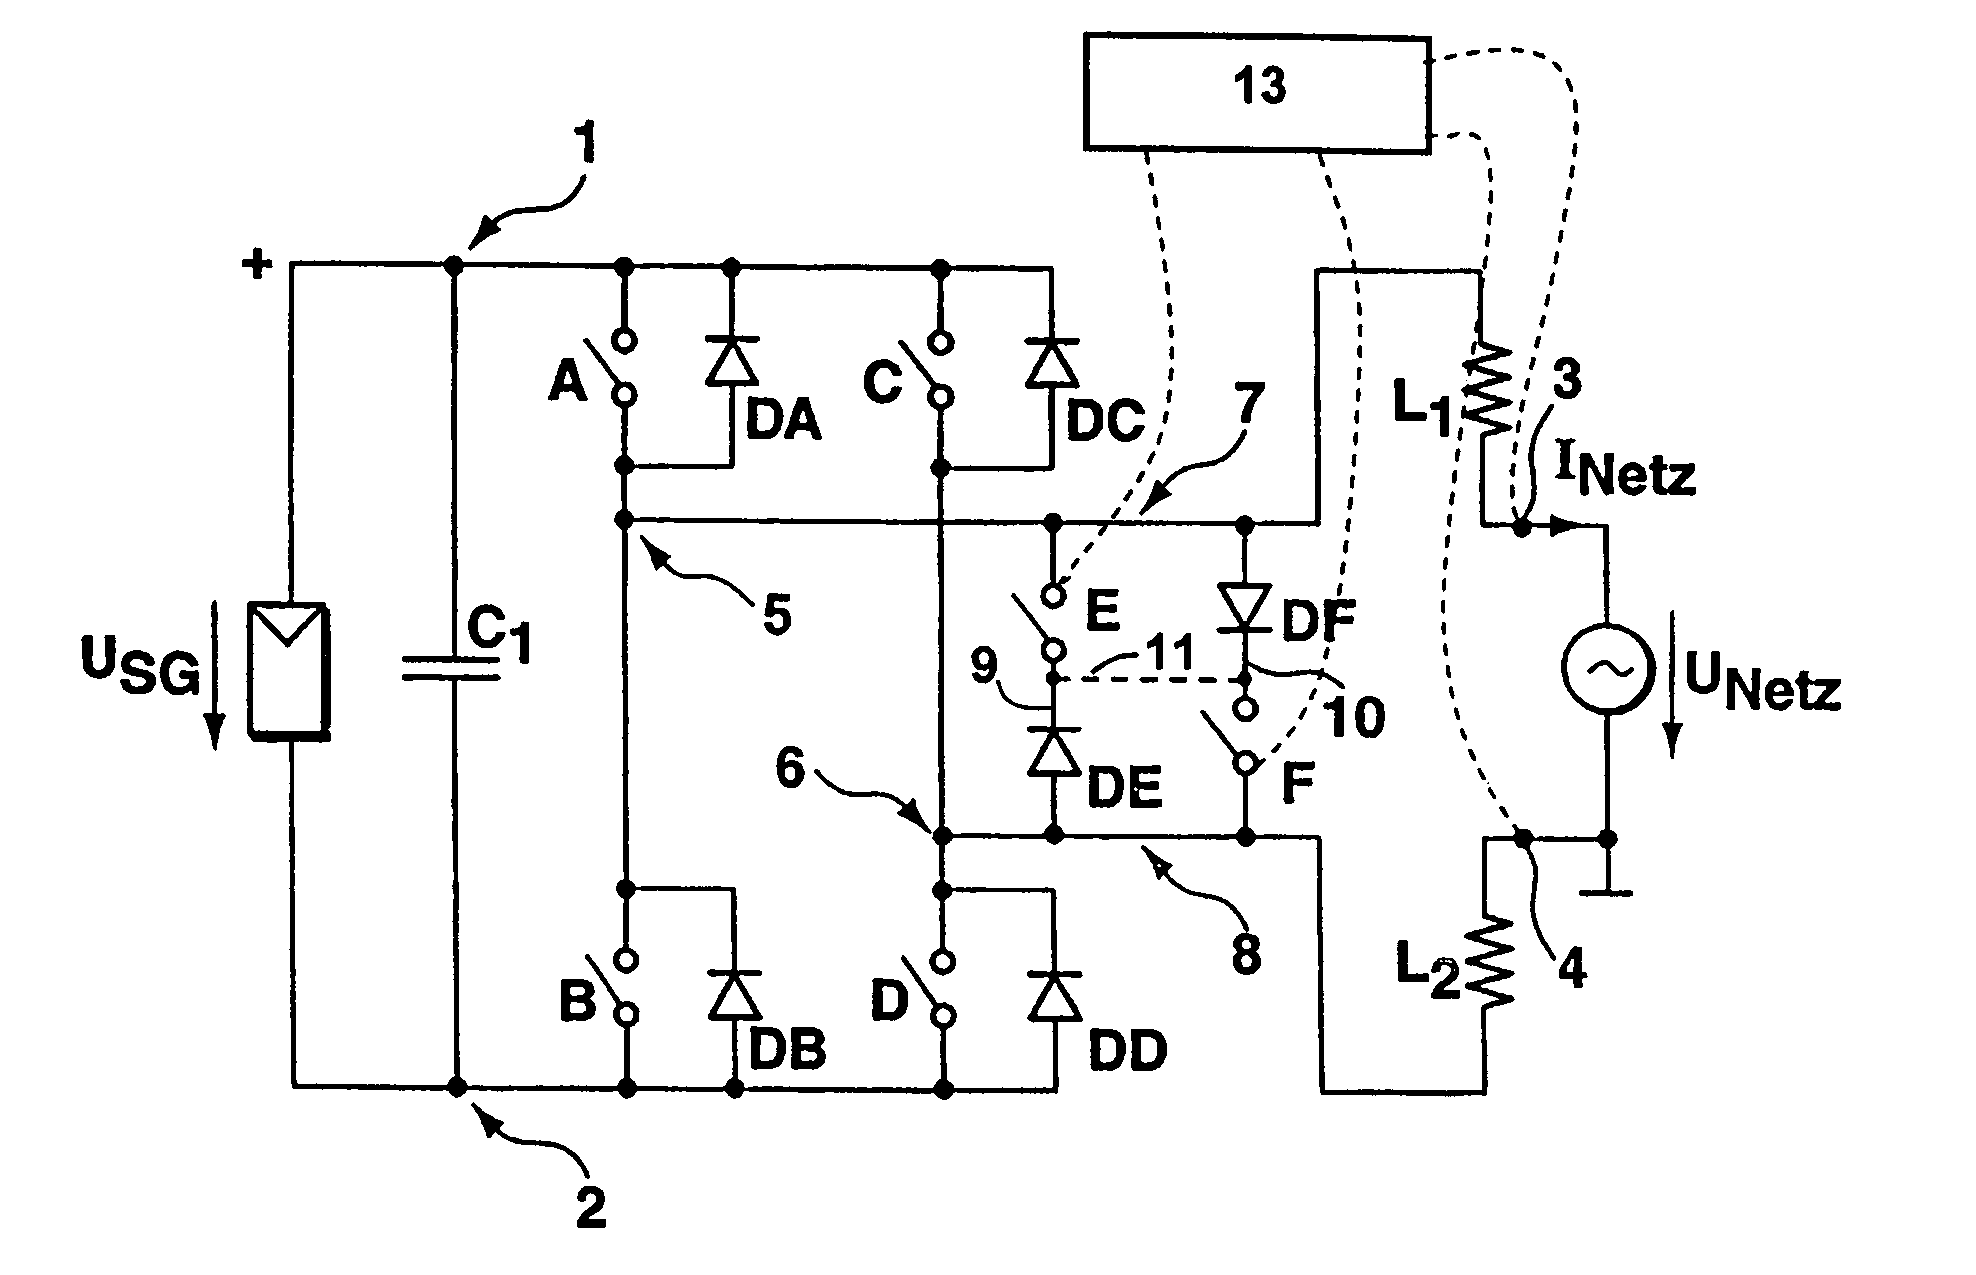 dissertation abstracts international voltage between